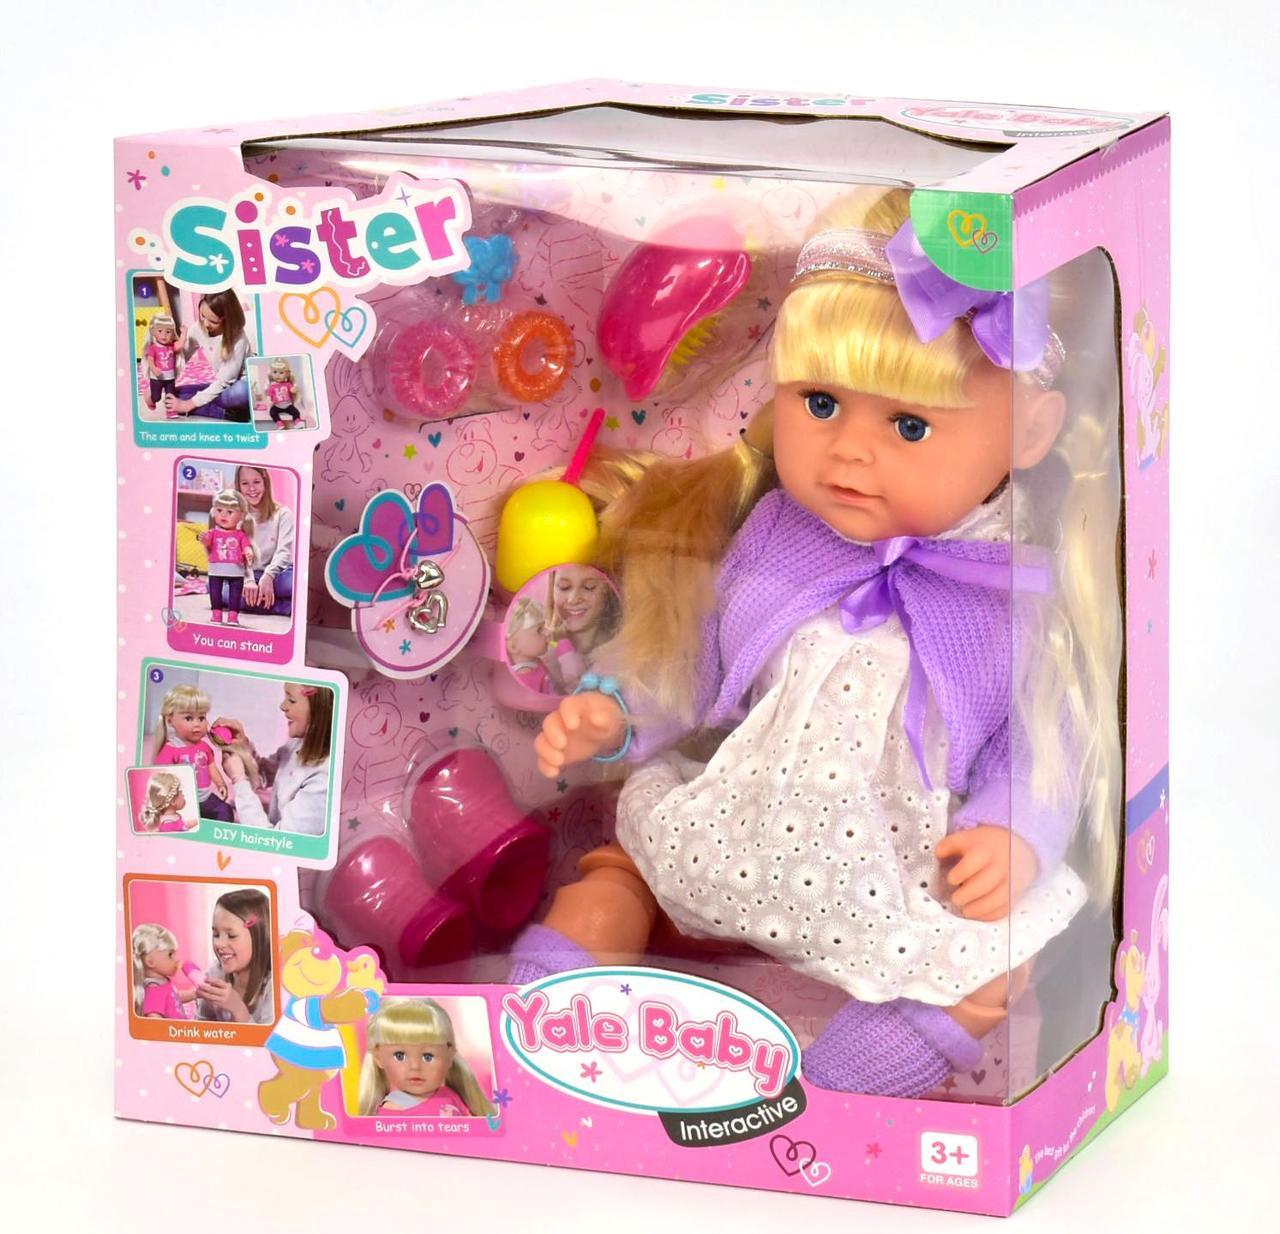 Кукла с волосами Sister Yale Baby BLS003Q